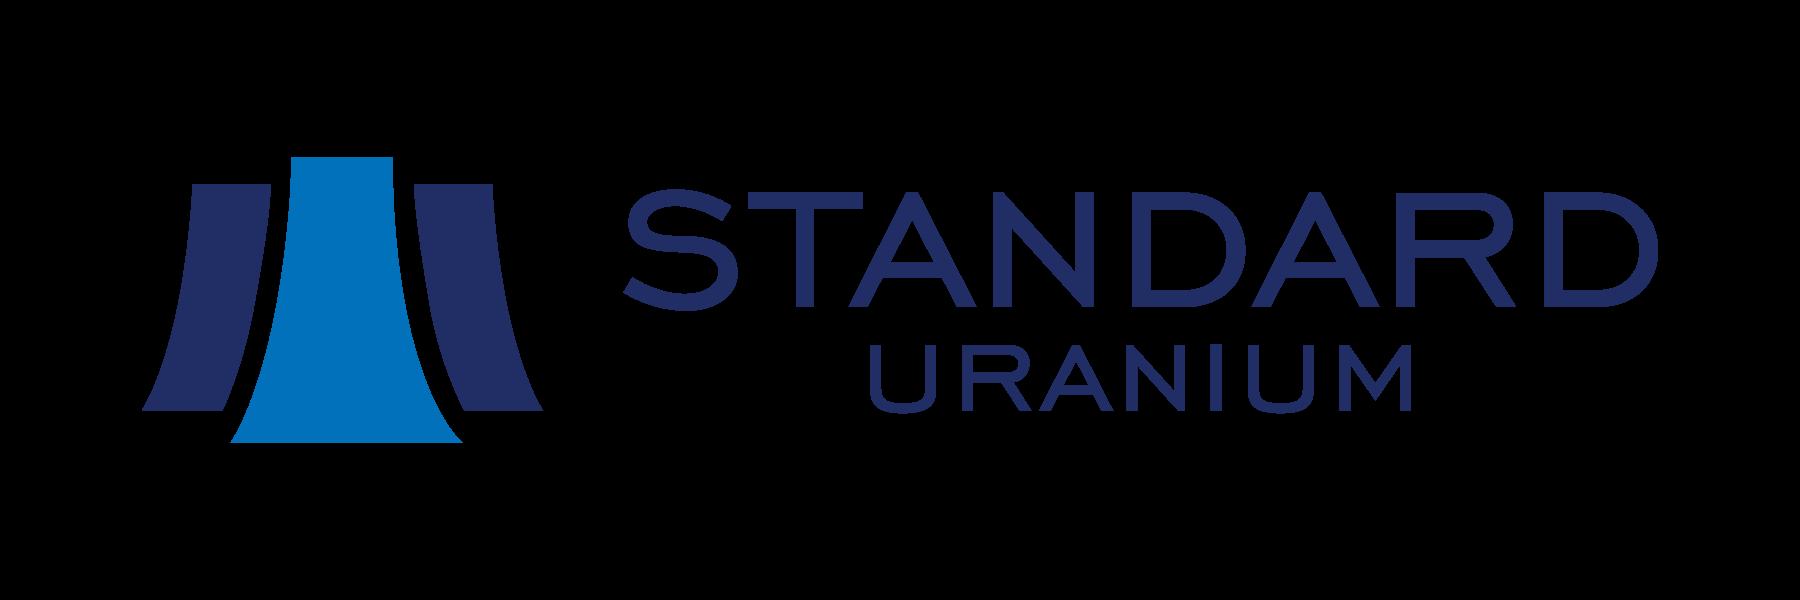 Standard Uranium Ltd